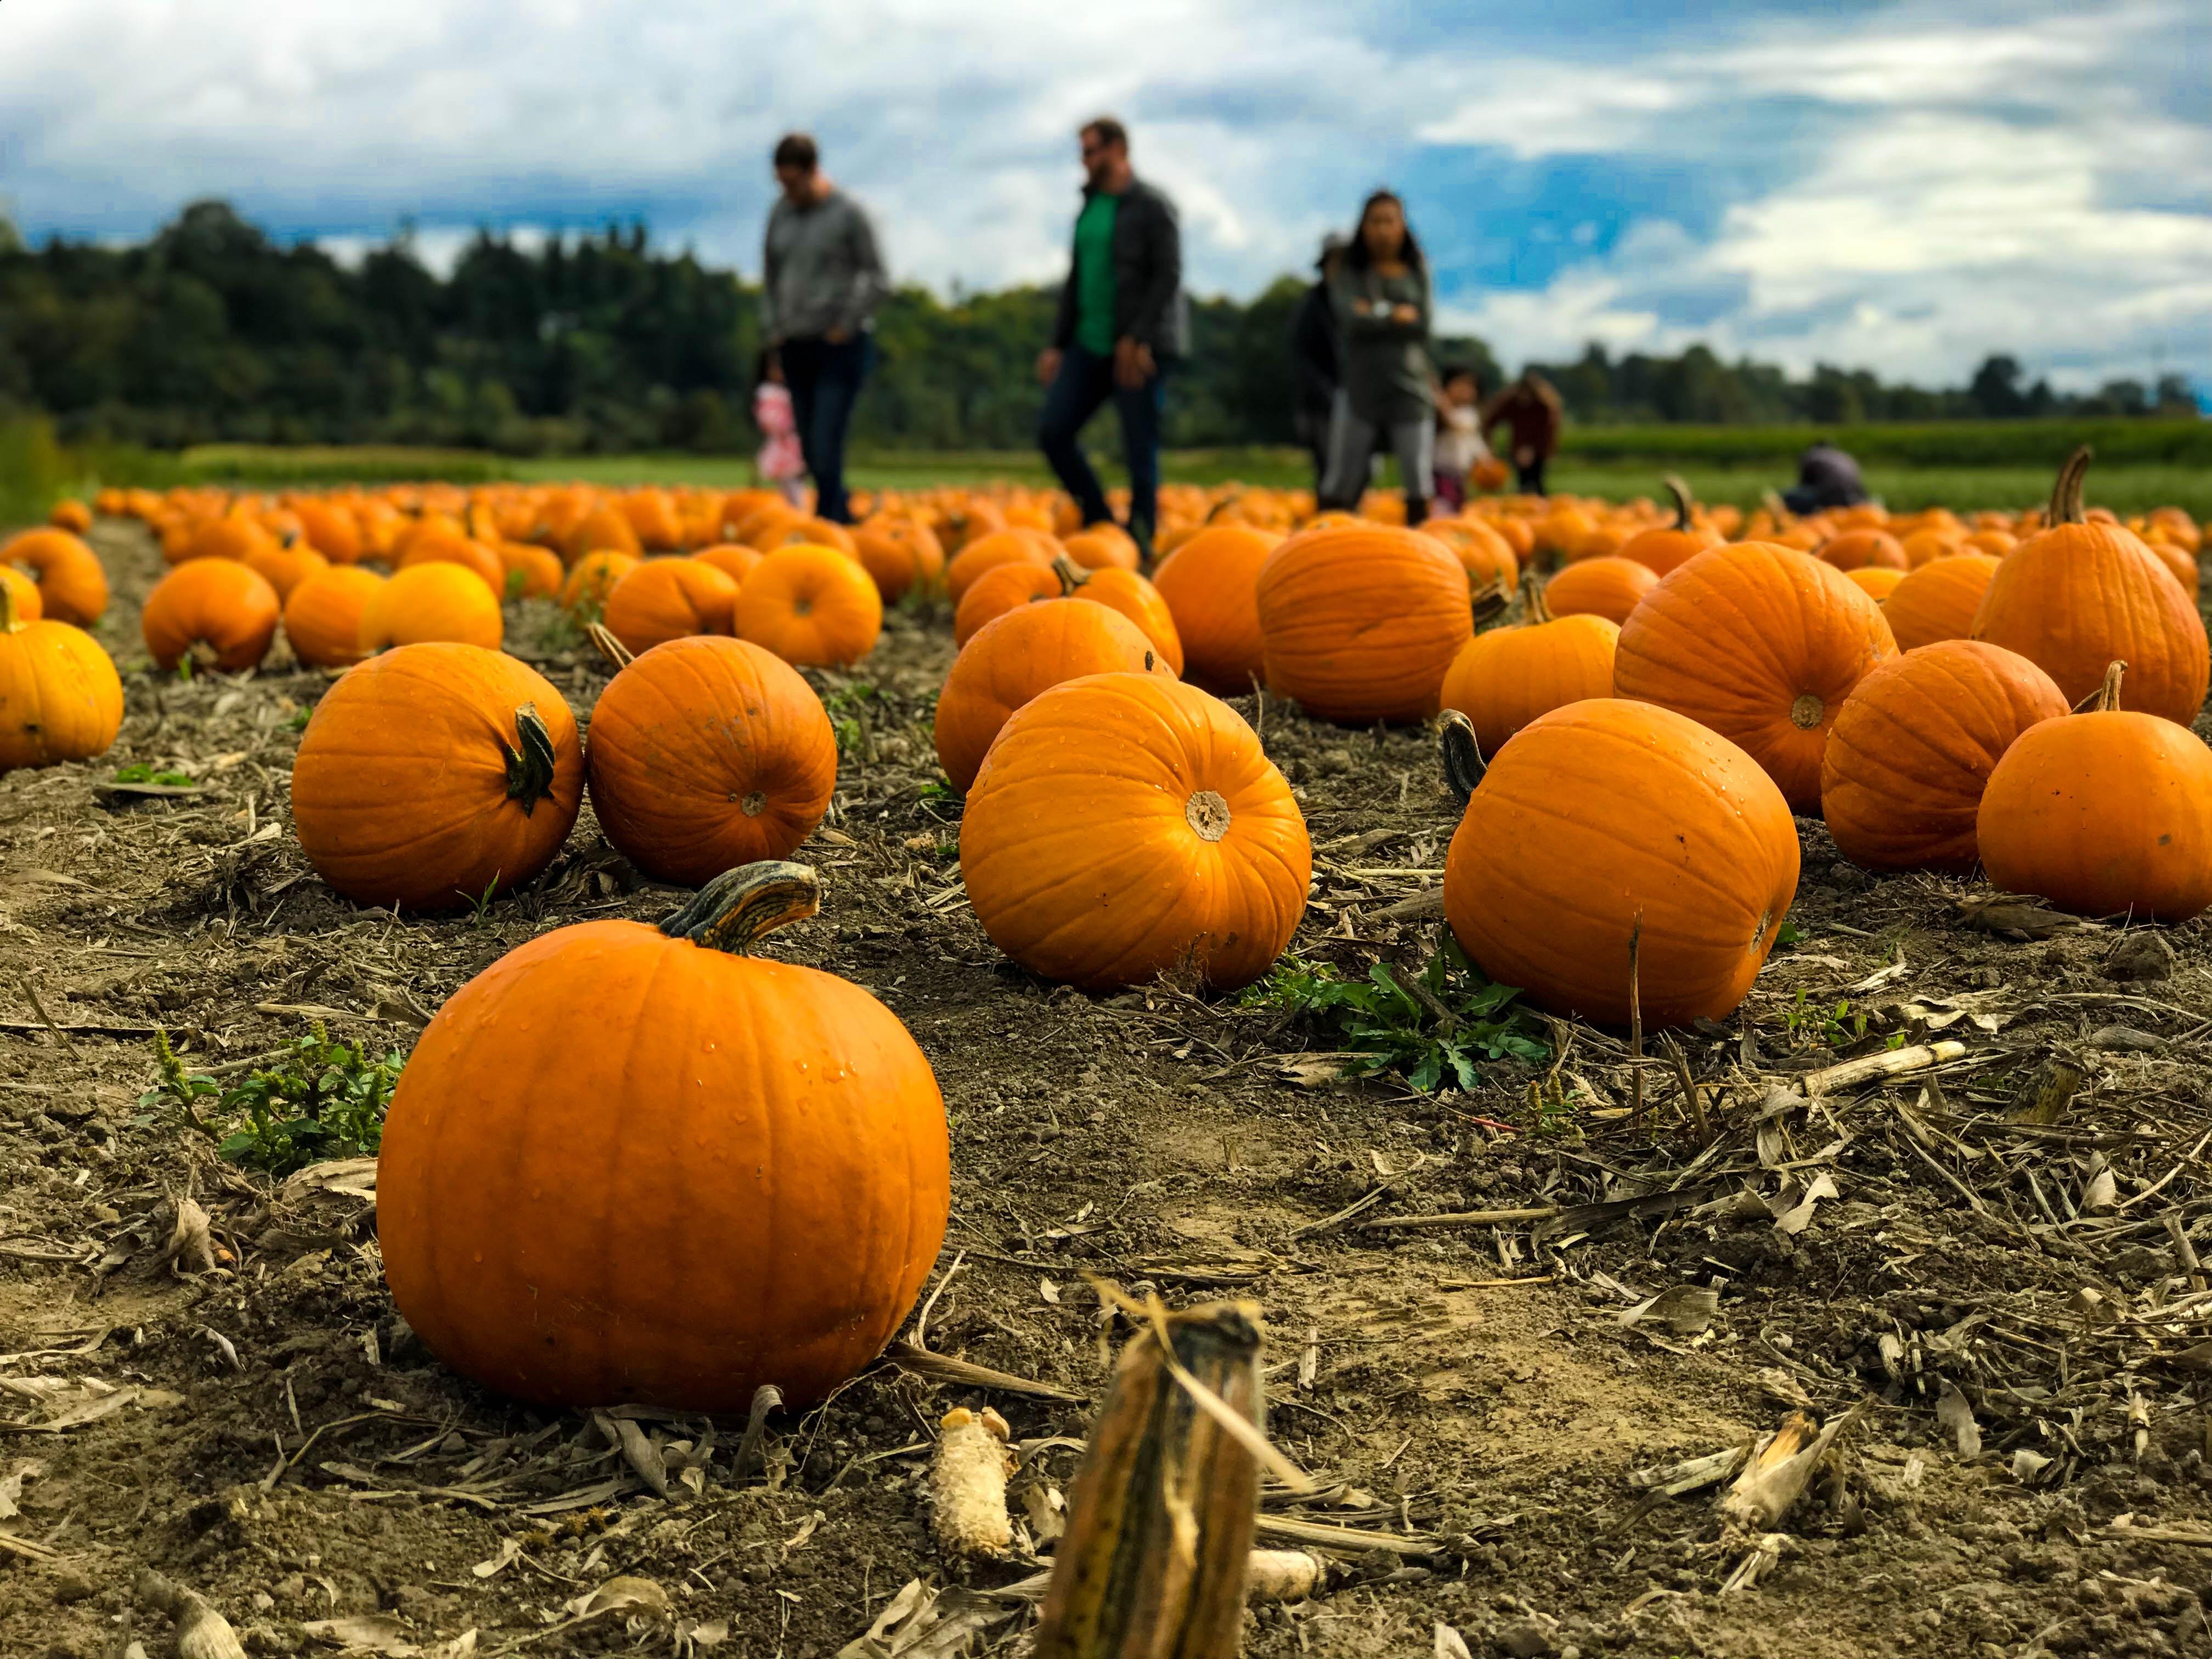 Family walking through a pumpkin patch